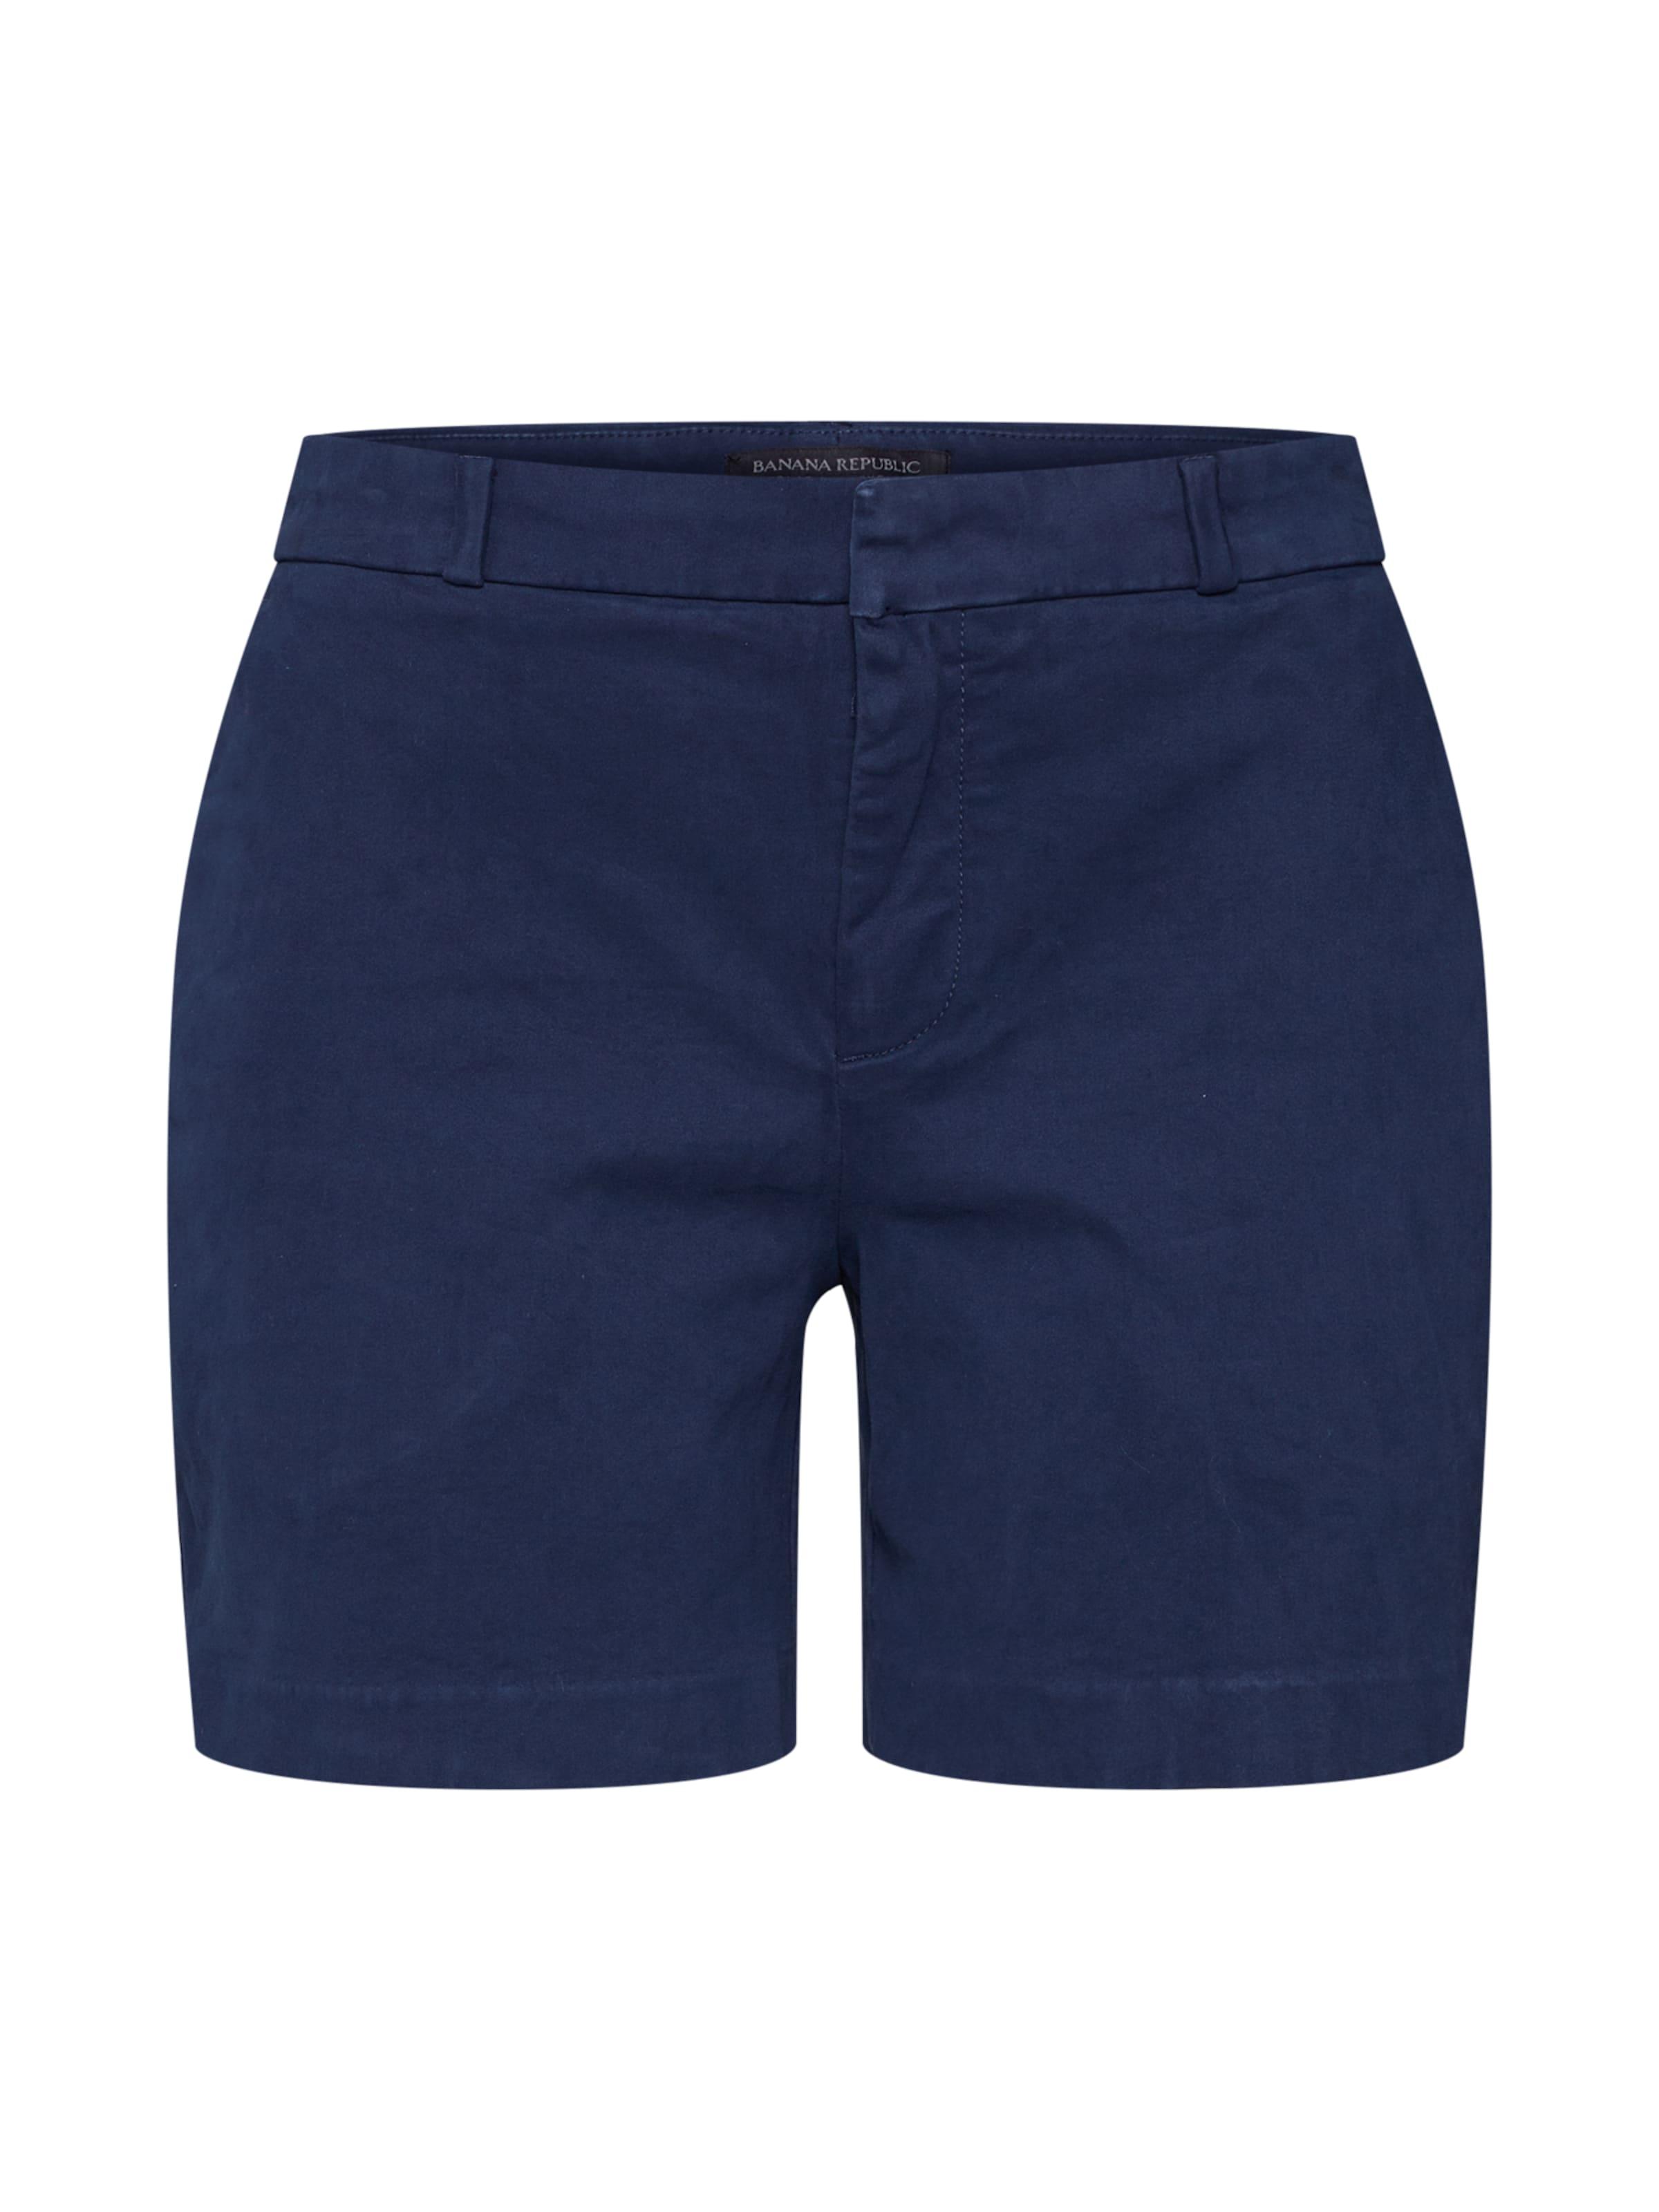 Navy '5 Republic In Chino' Banana Shorts Inch 2IeWED9YHb